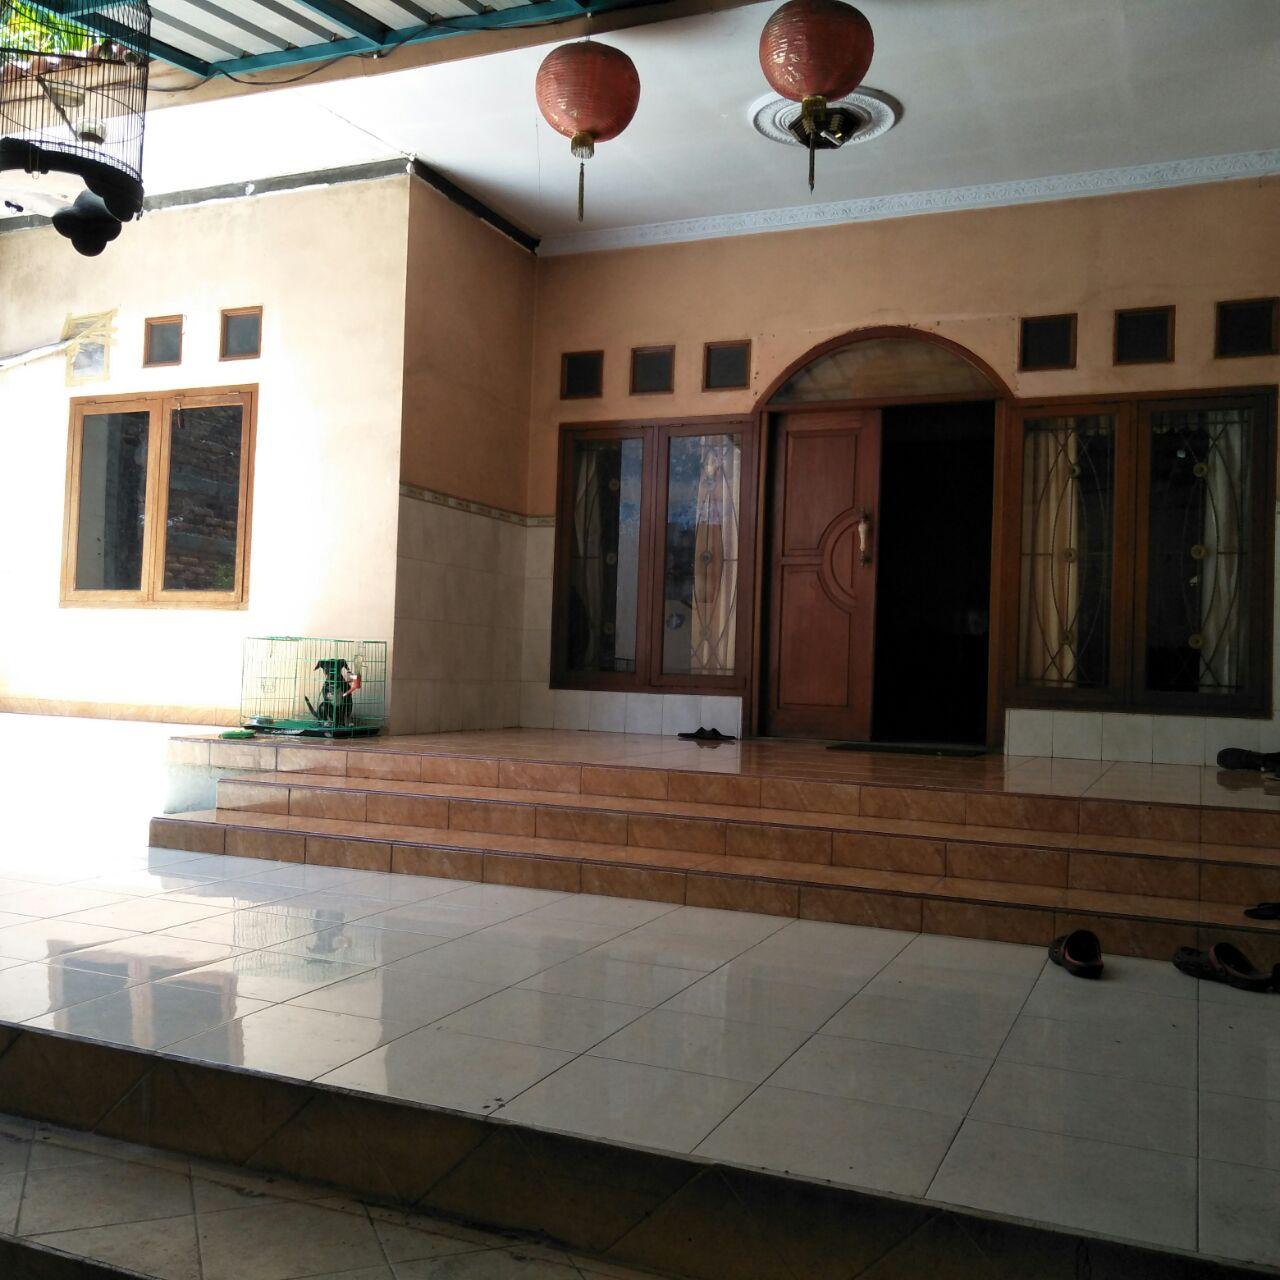 Dijual Cepat Workshop beserta rumah tinggal di pinggir Jalan Raya Citayam dekat stasiun depok lama